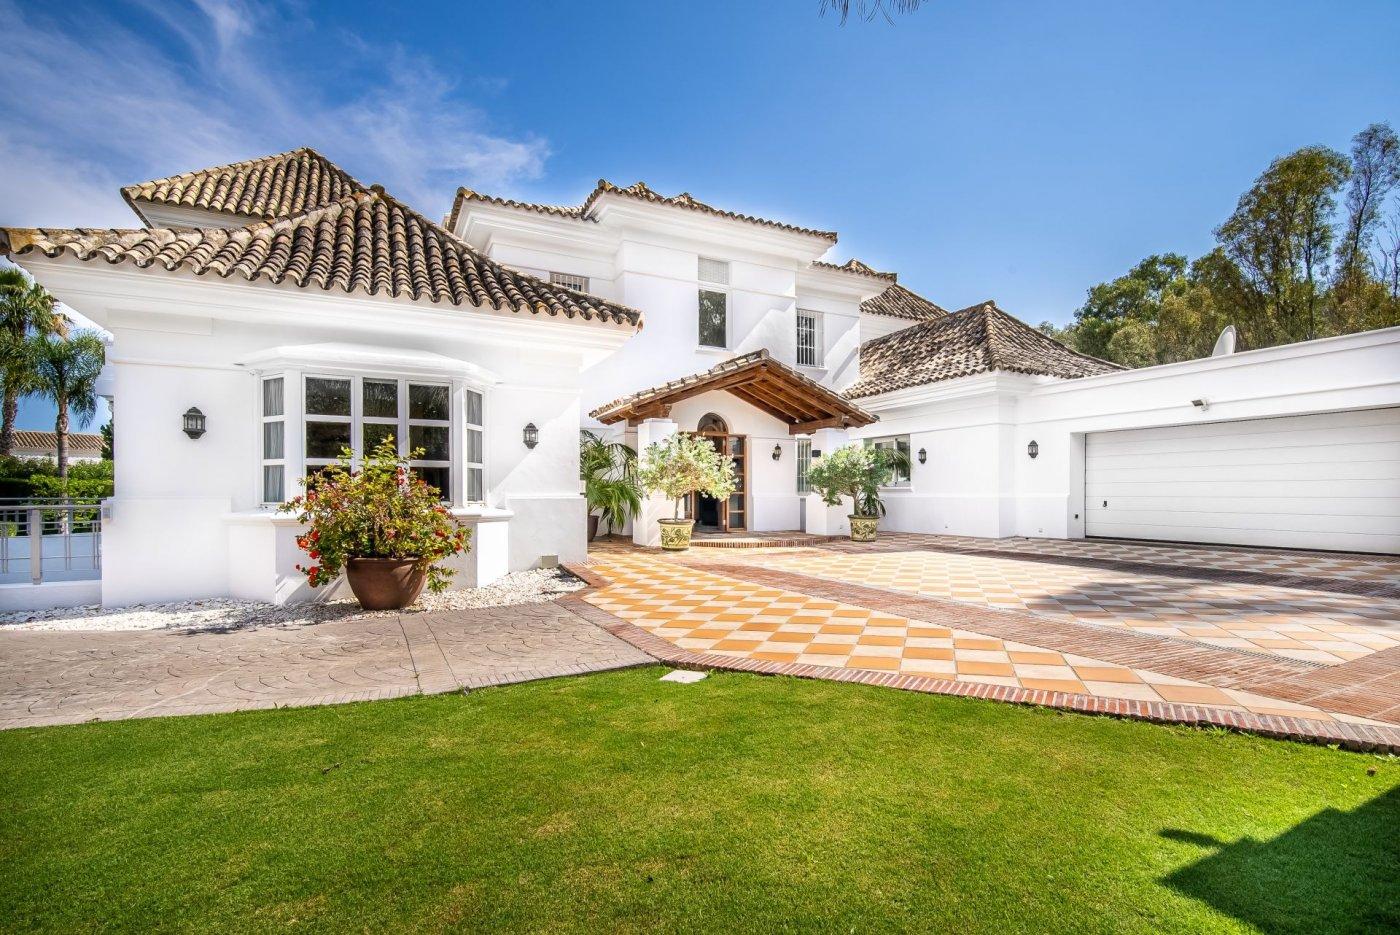 Villa, Nueva Andalucía in the heart of Marbella's Golf Valley